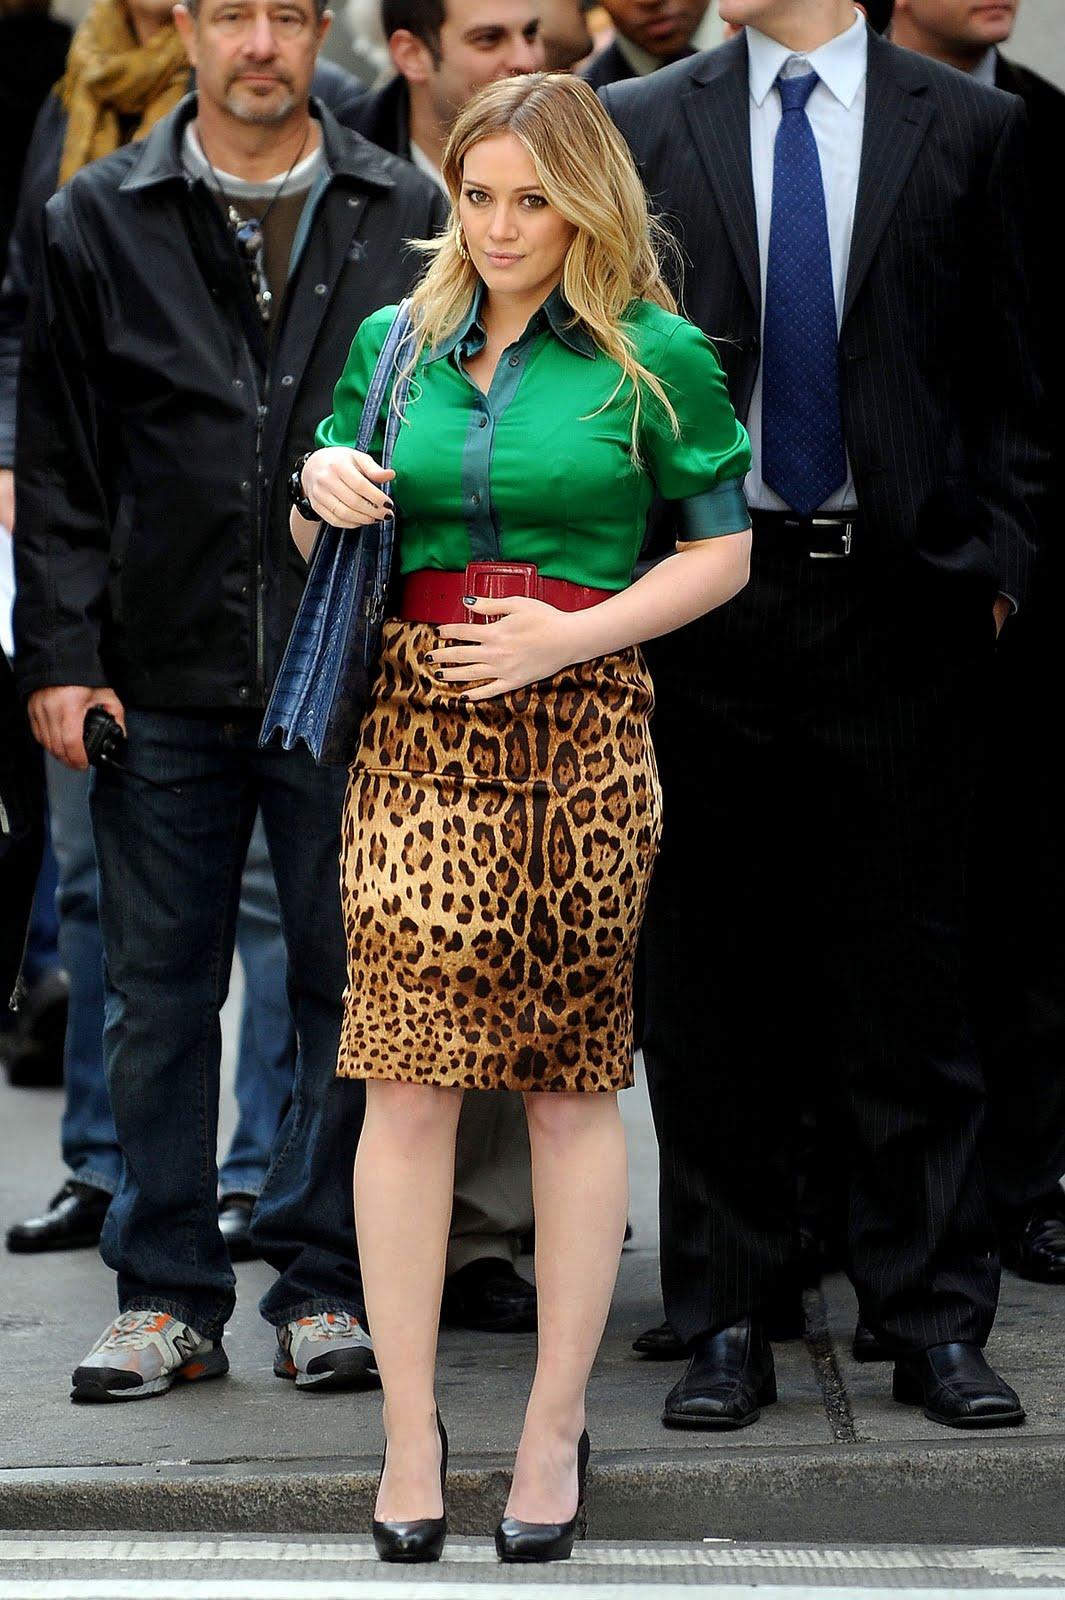 http://4.bp.blogspot.com/_hZpcjbQpsVo/S-YcJ4bk9QI/AAAAAAAAYa0/_ntXVReuWjc/s1600/13991_Nen_Hilary_Duff_On_the_set_The_Business_Of_Falling_In_Love08_122_423lo.jpg